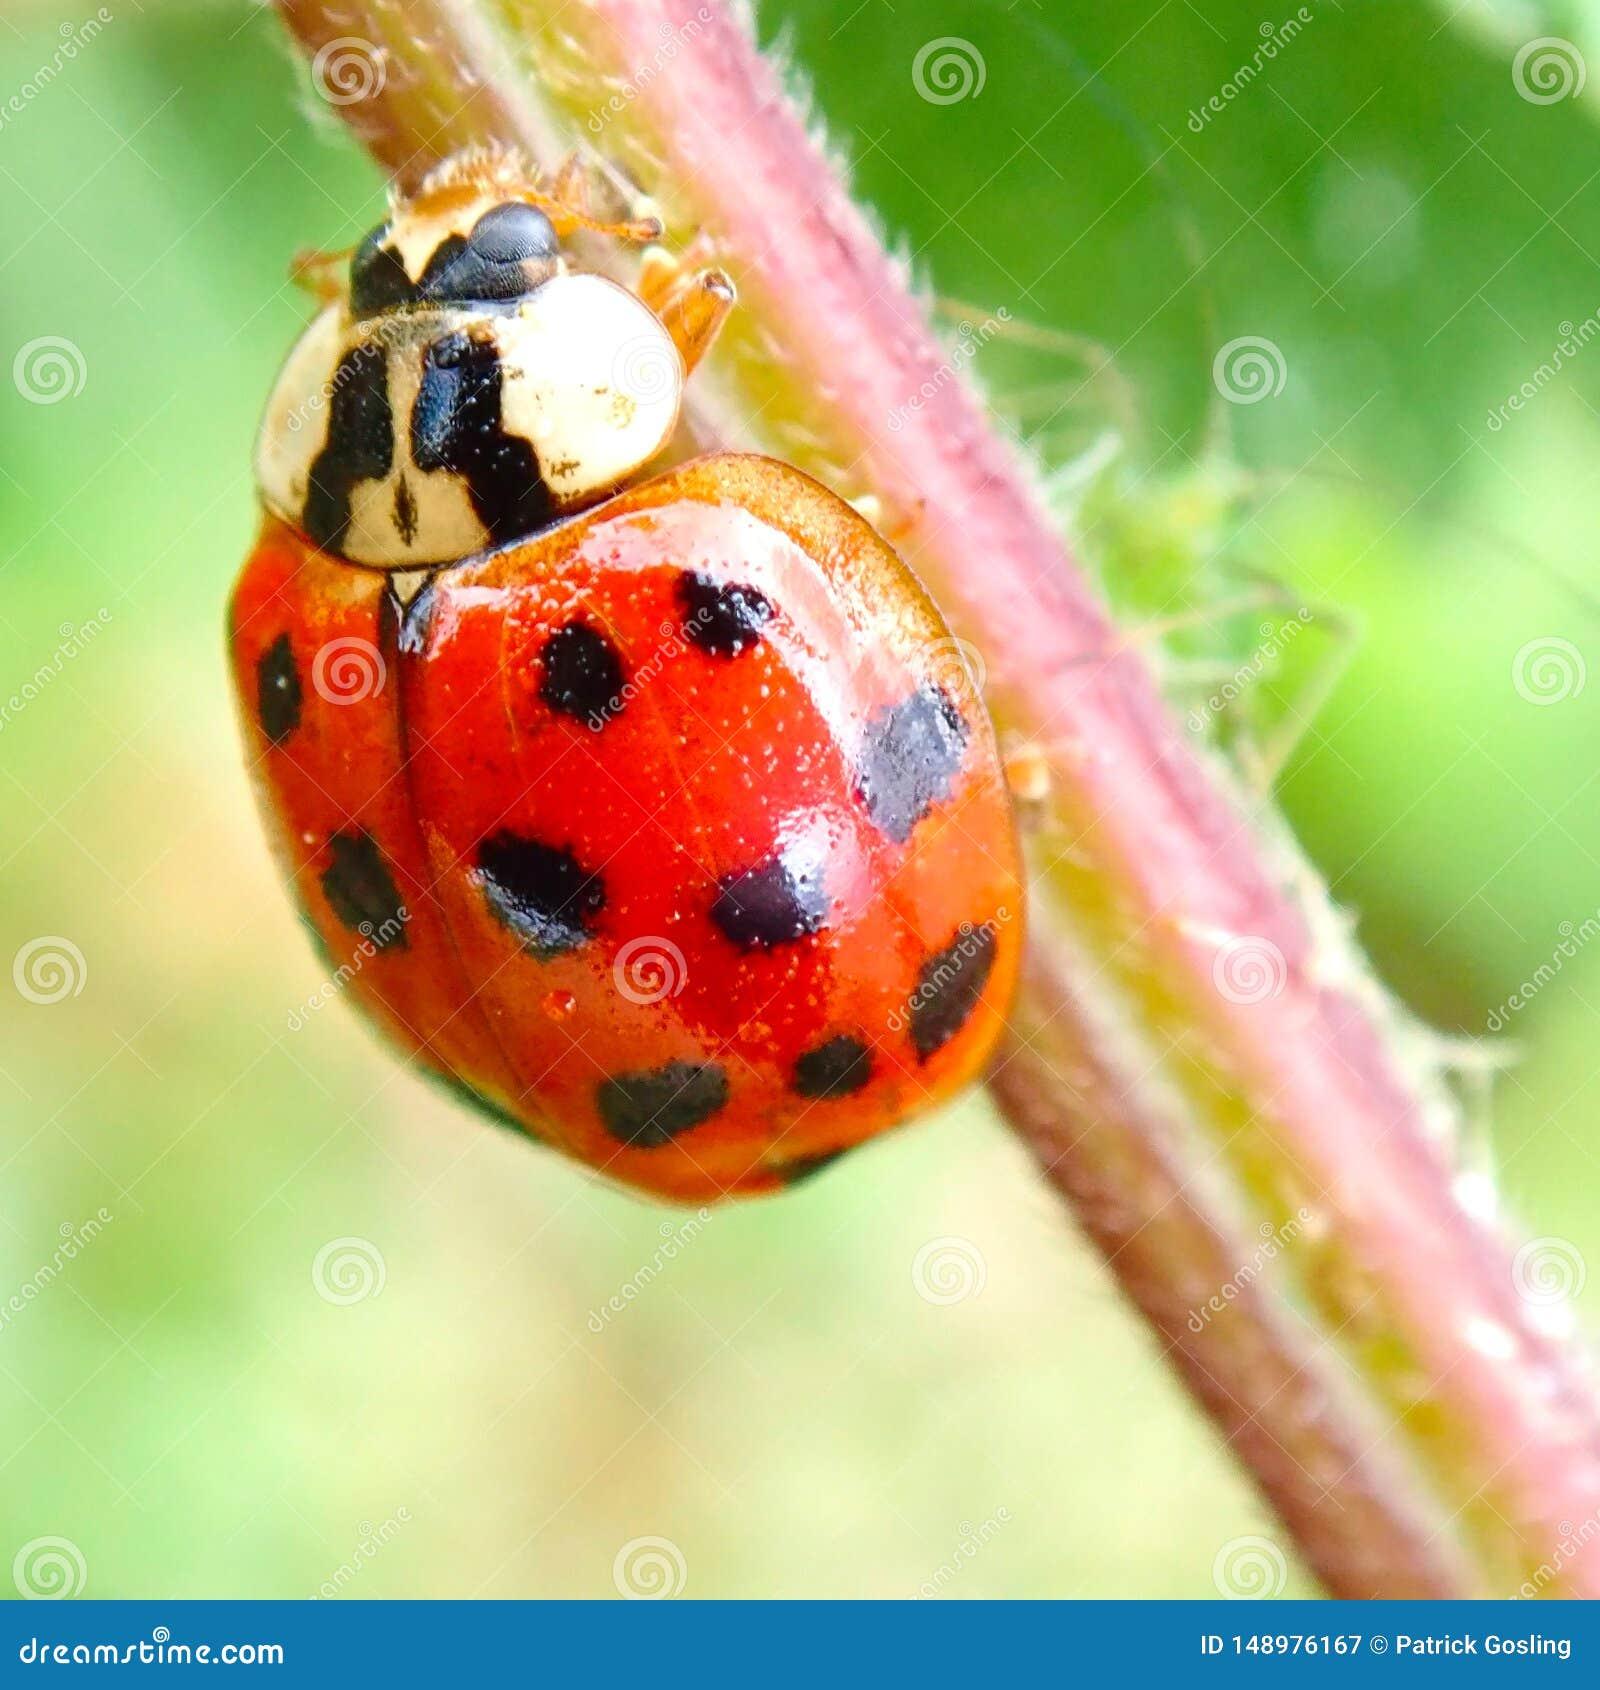 Harmonia Axyridis  or Harlequin Ladybird.